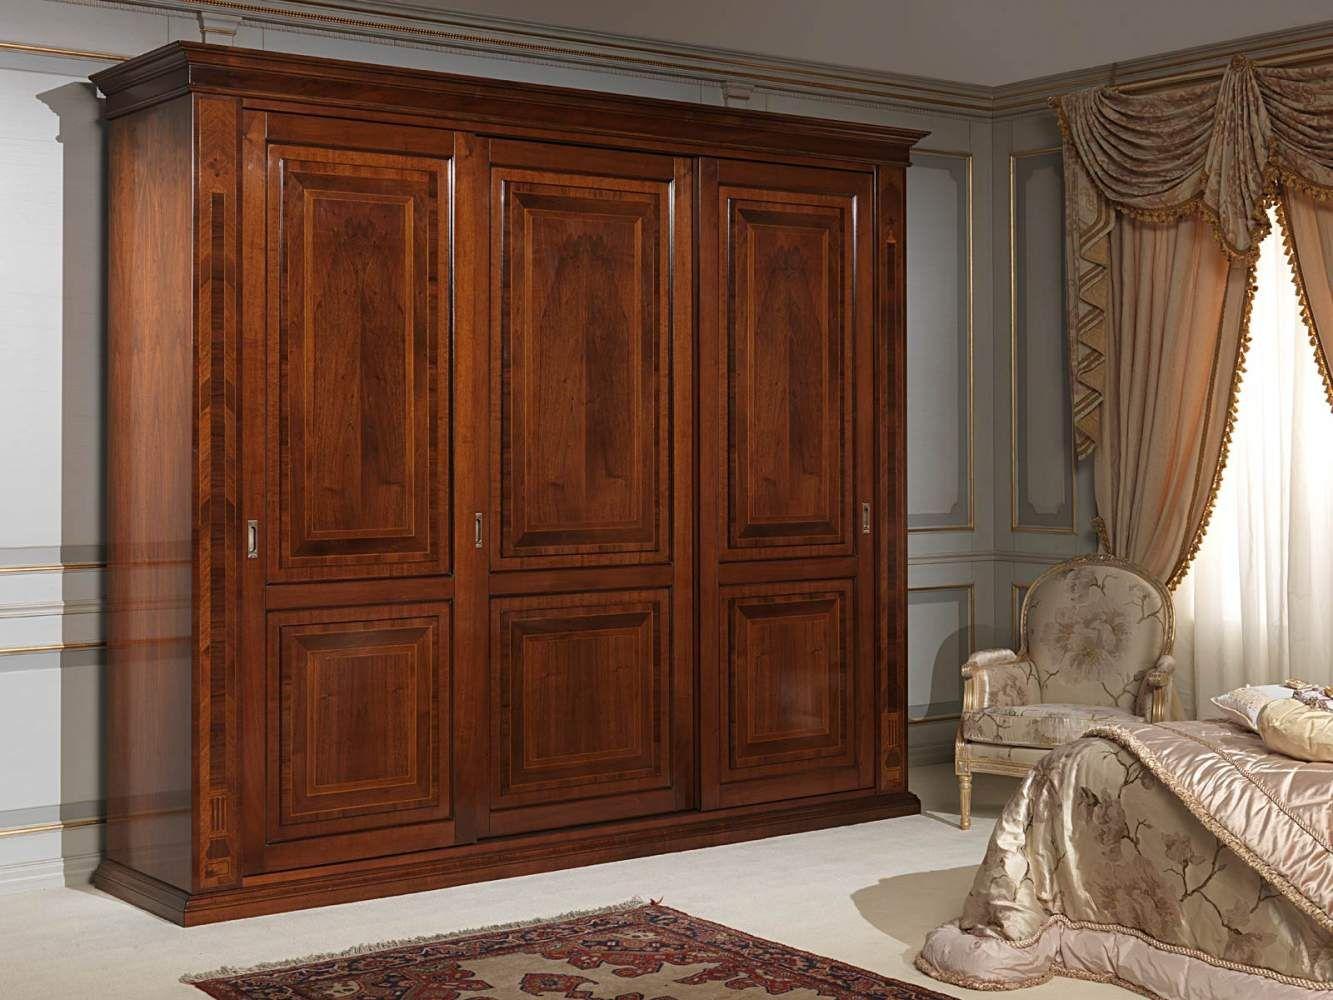 Th century french bedroom three door wardrobe with inlays